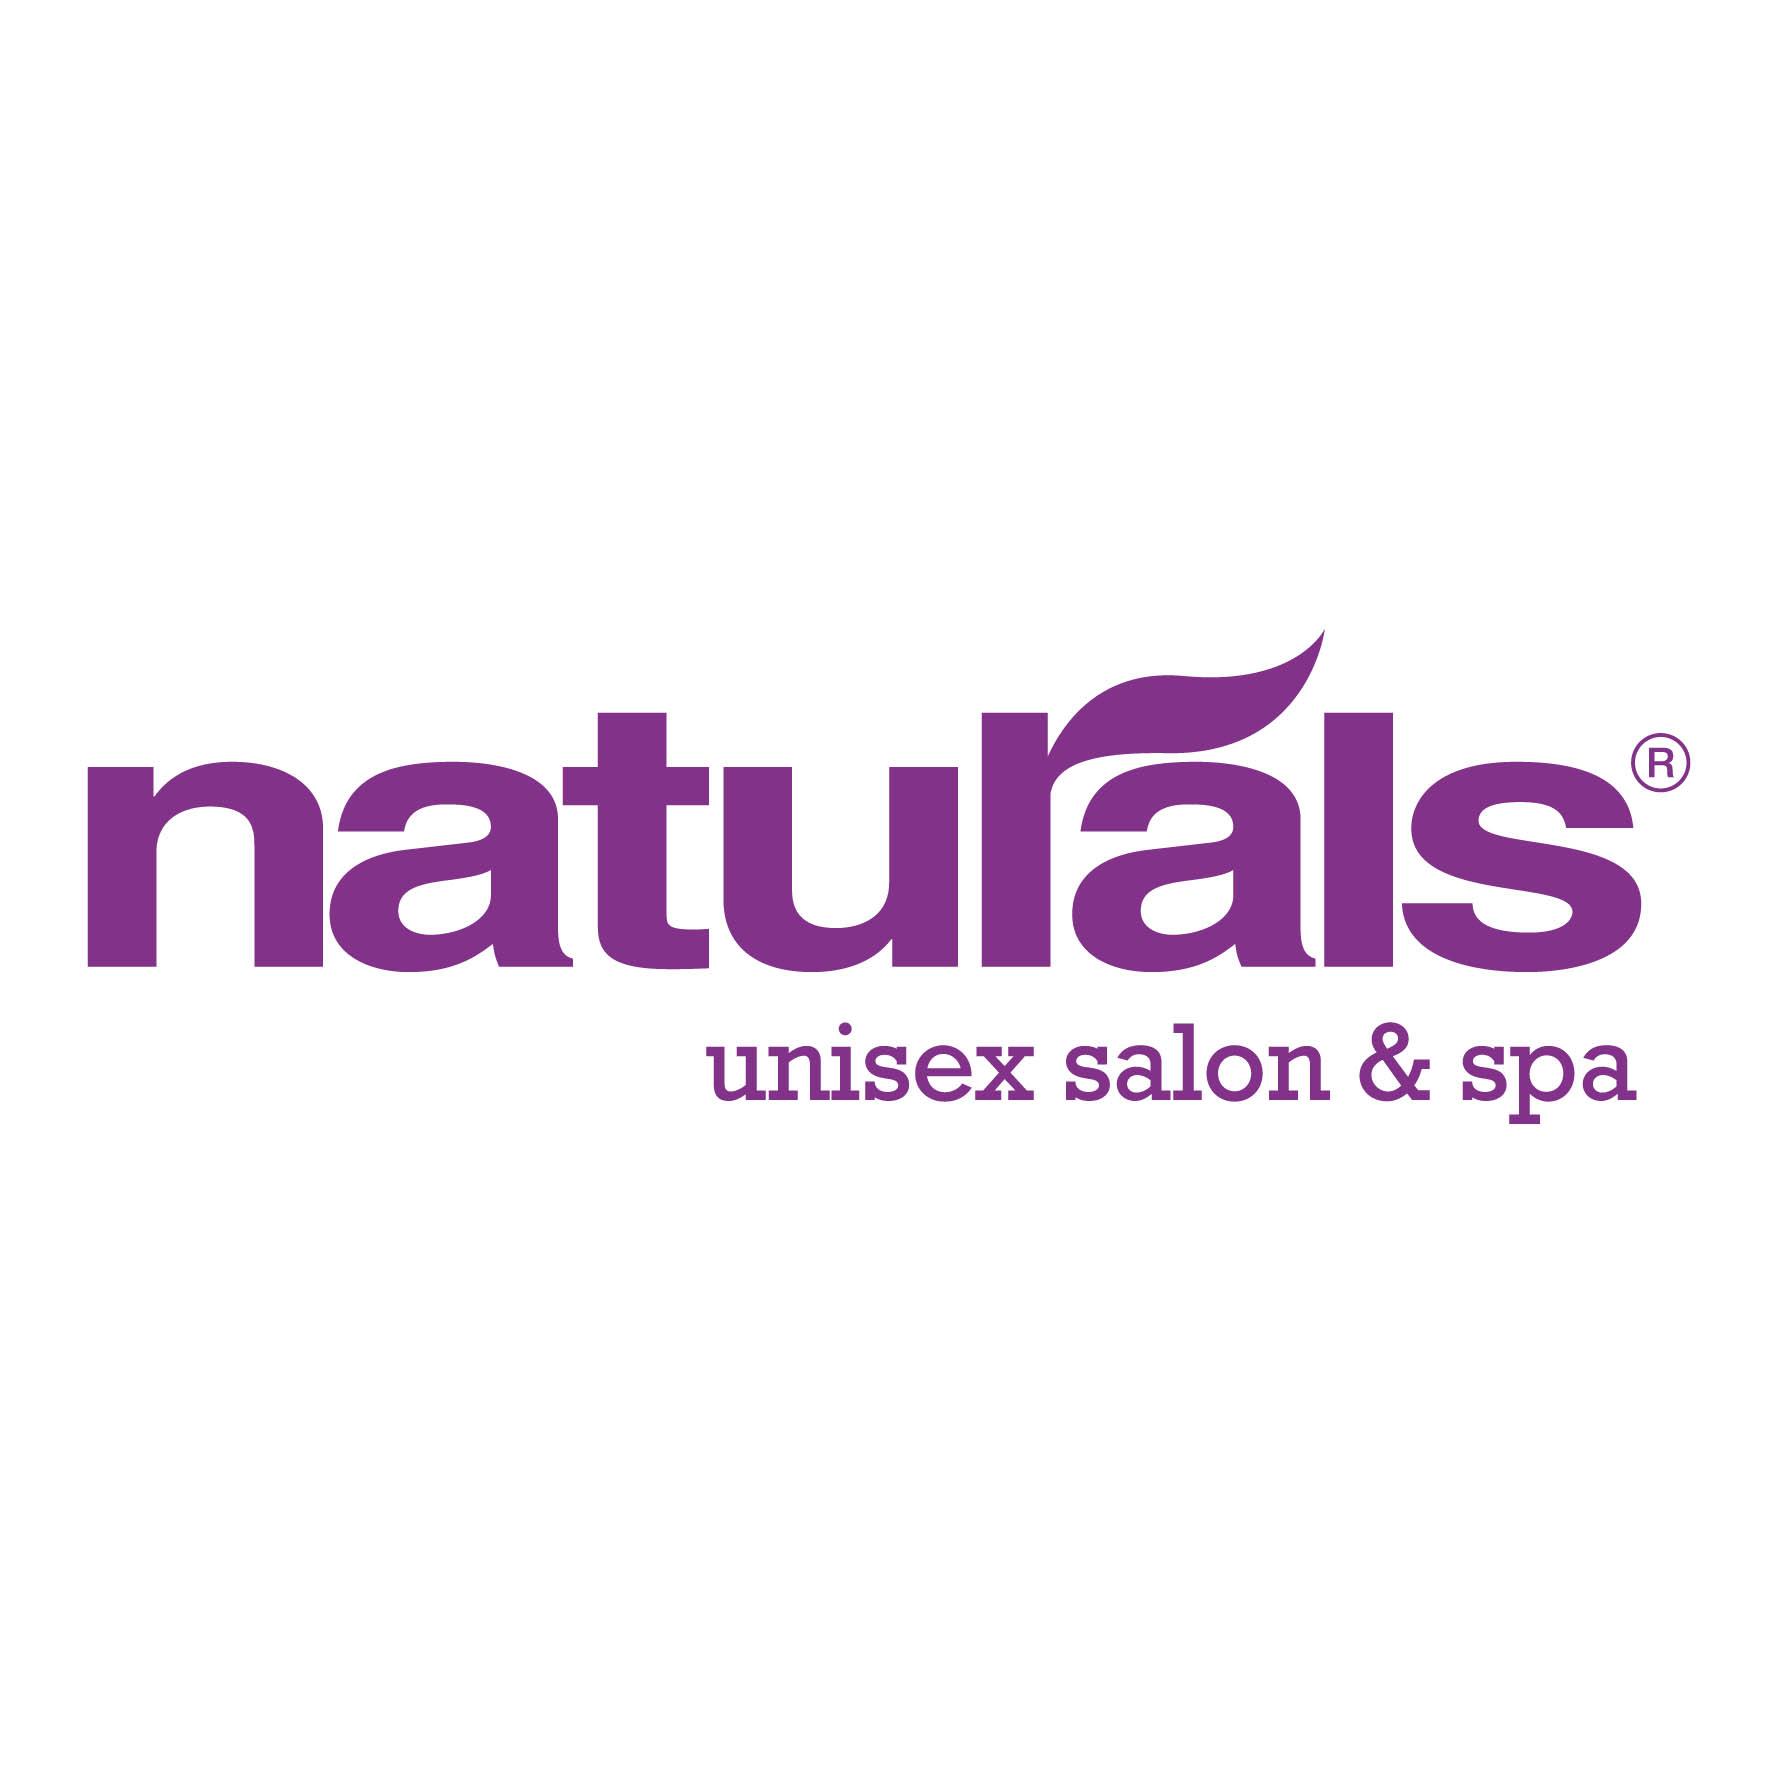 Naturals Family Salon Spa - Triplicane - Chennai Image